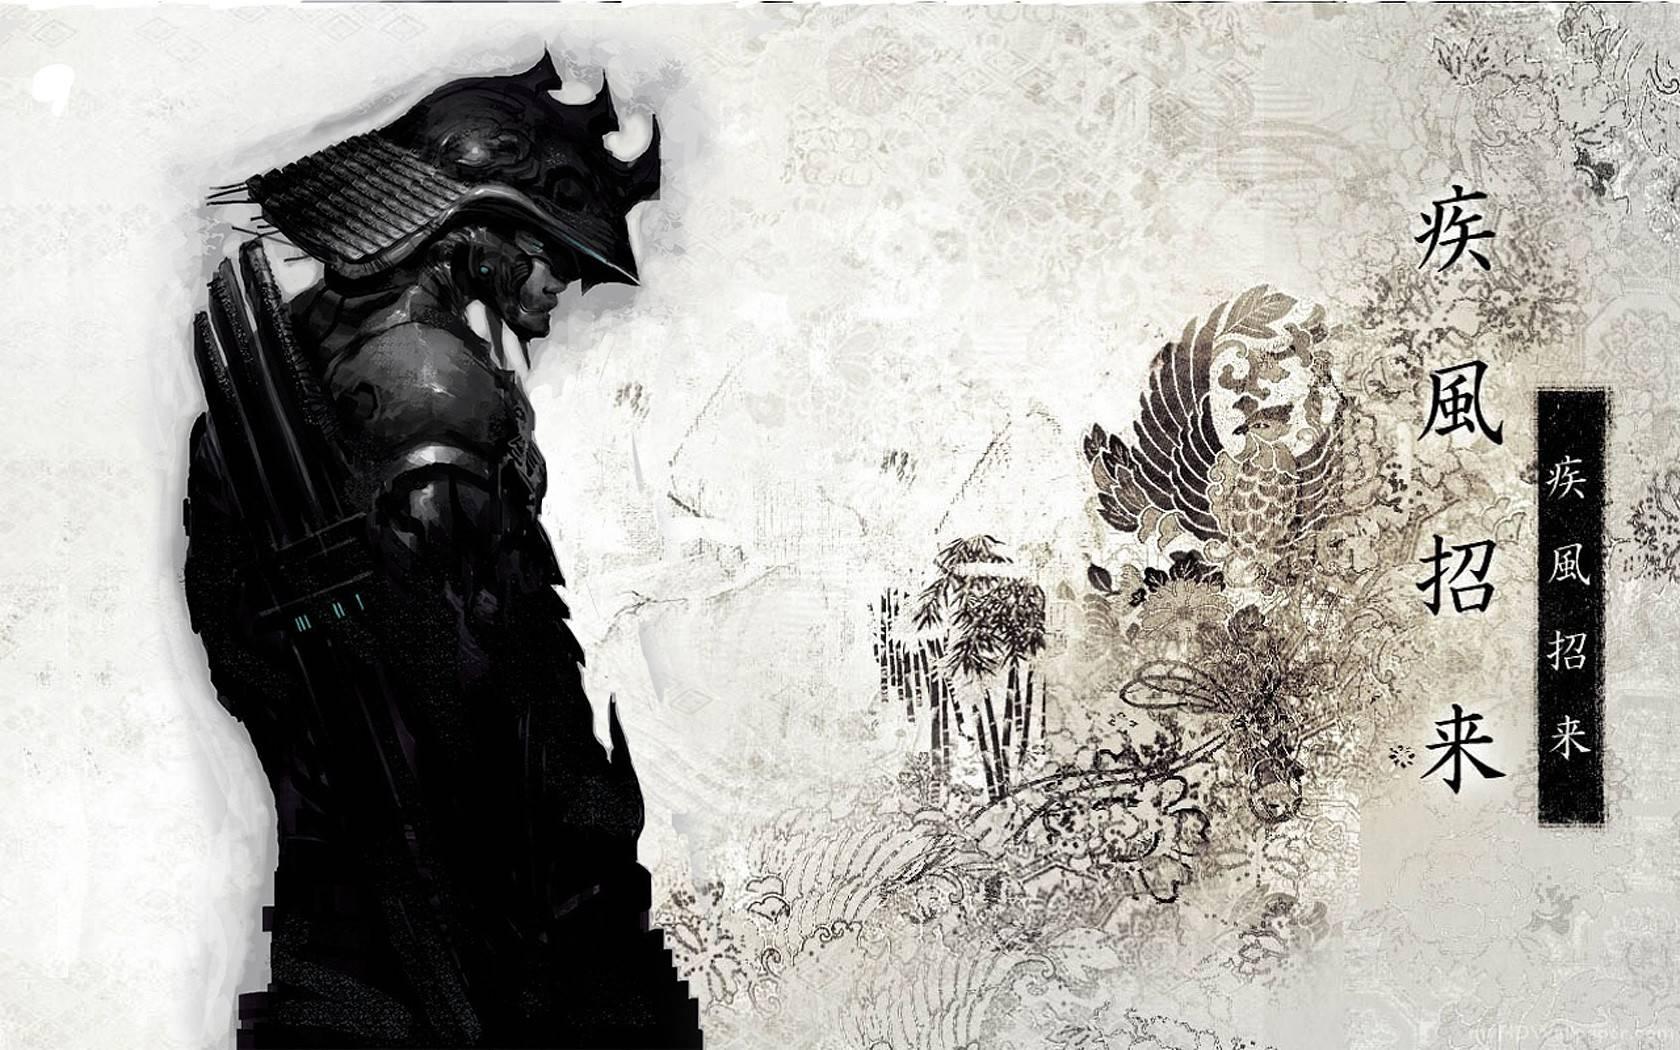 Hapon samurai 1680x1050 wolpeyper 1684059